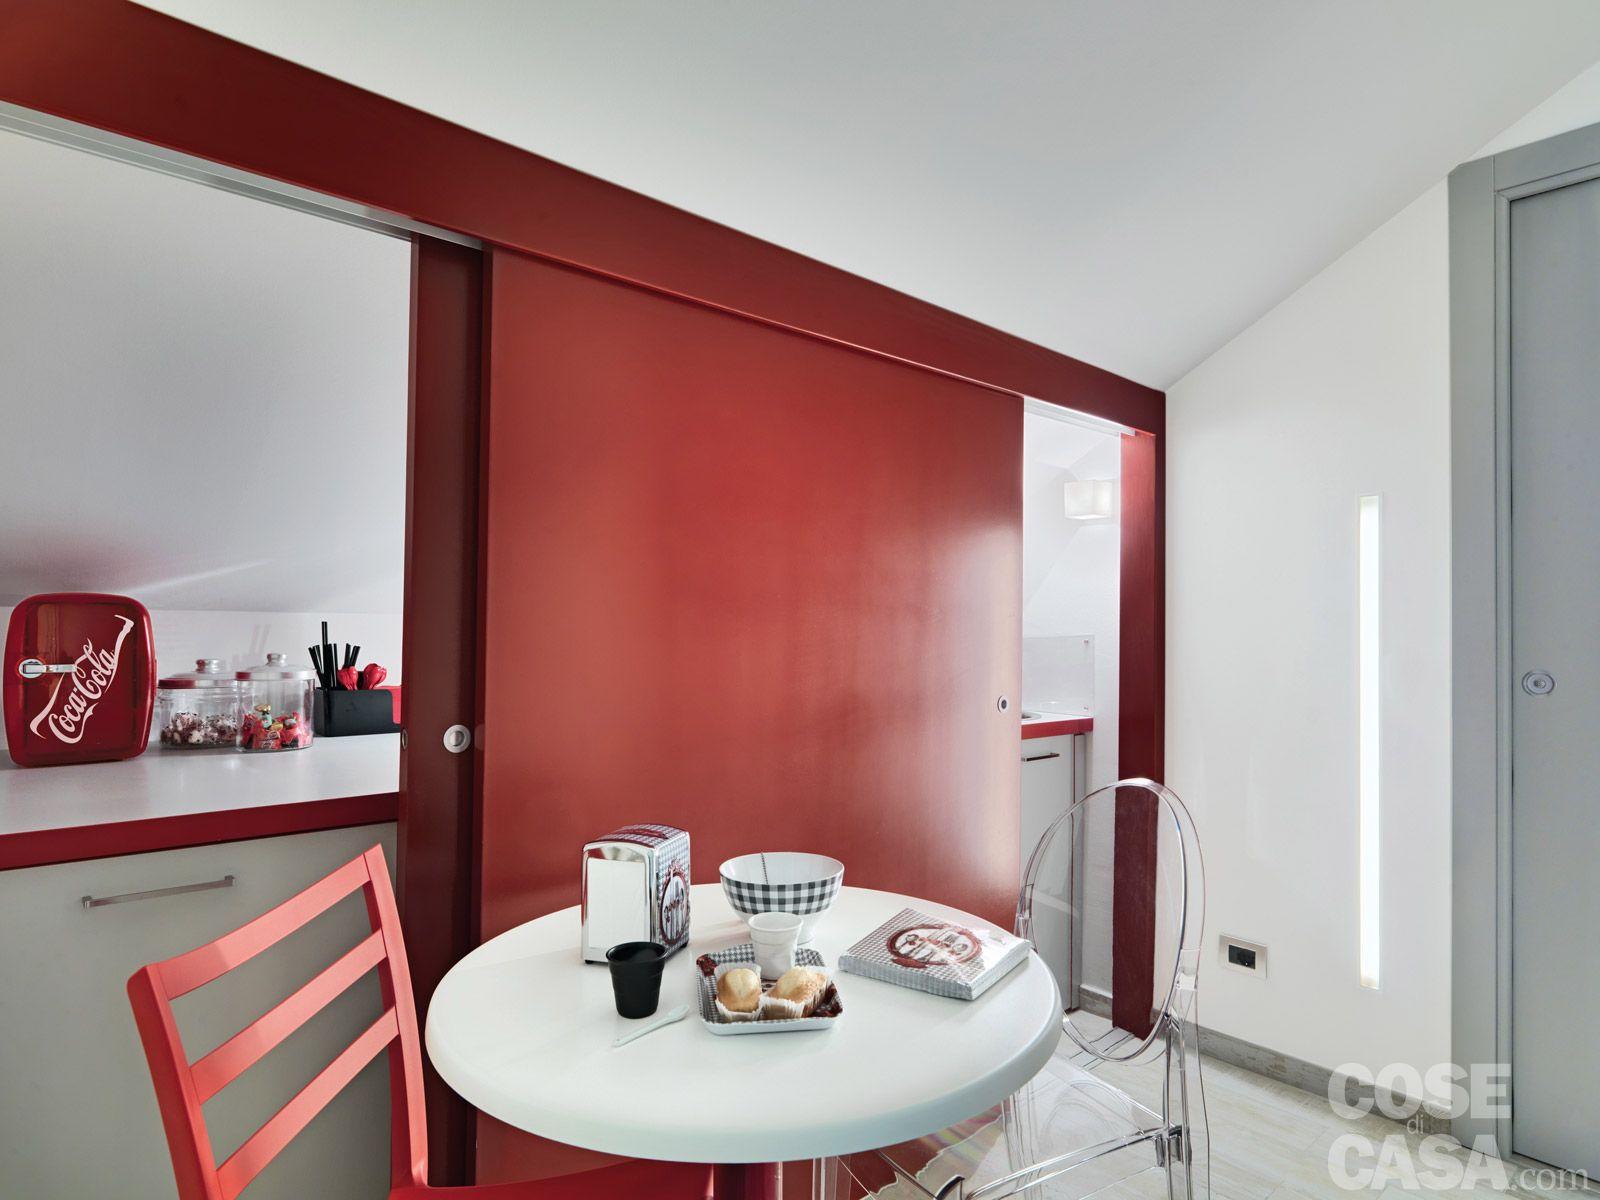 Tavola Per Cucina. Emejing Tavoli In Vetro Per Cucina Photos ...